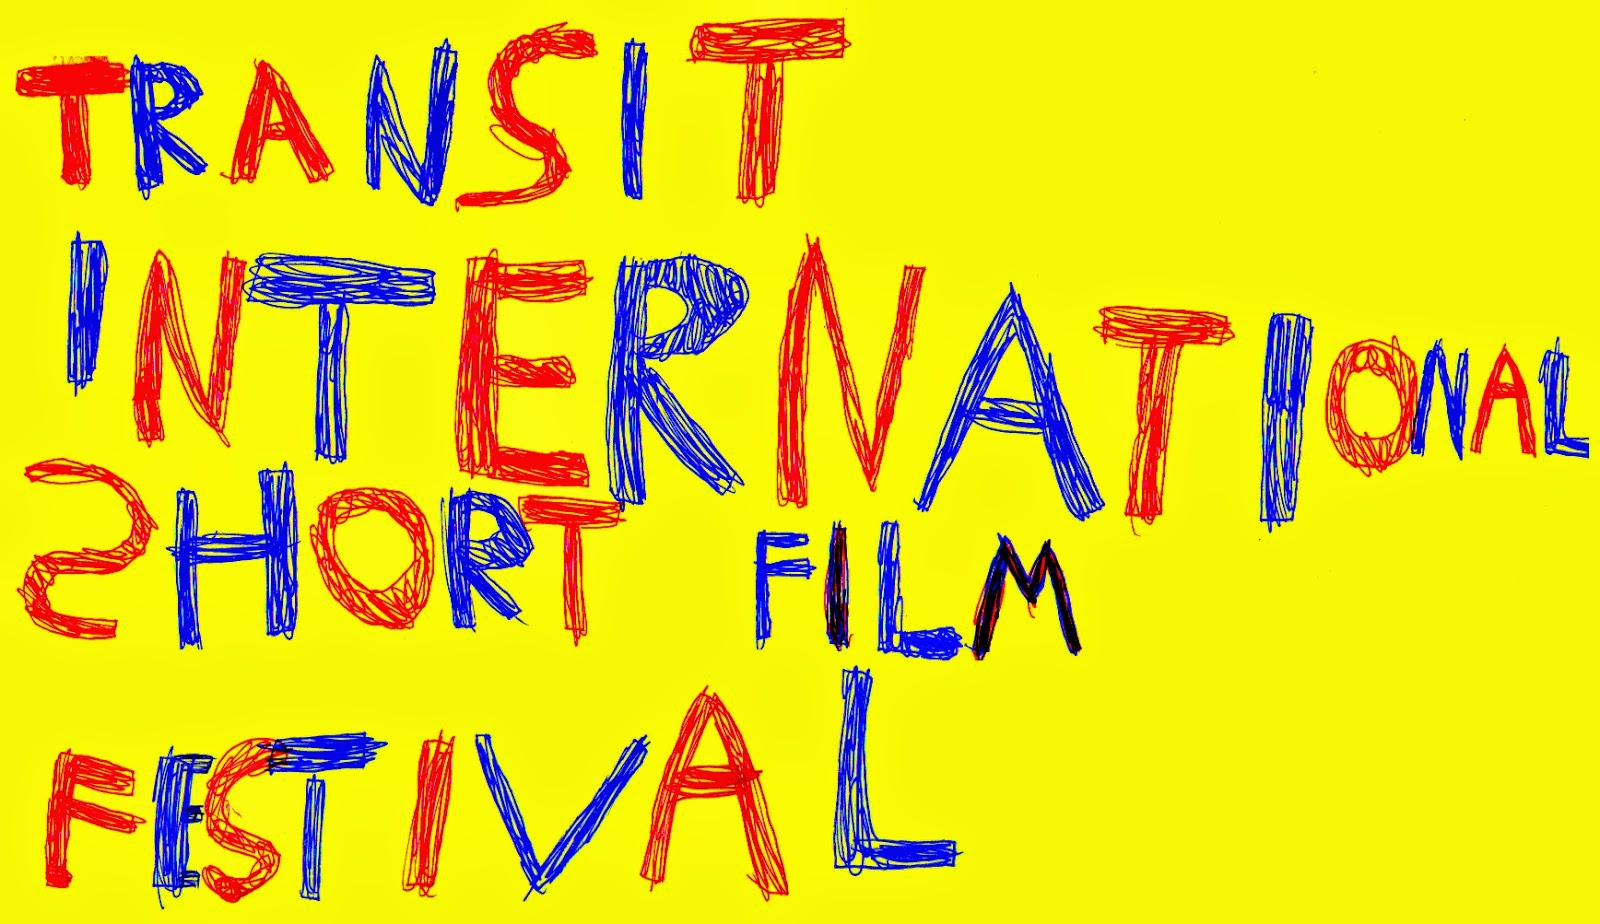 TRANSIT SHORT FILM FESTIVAL